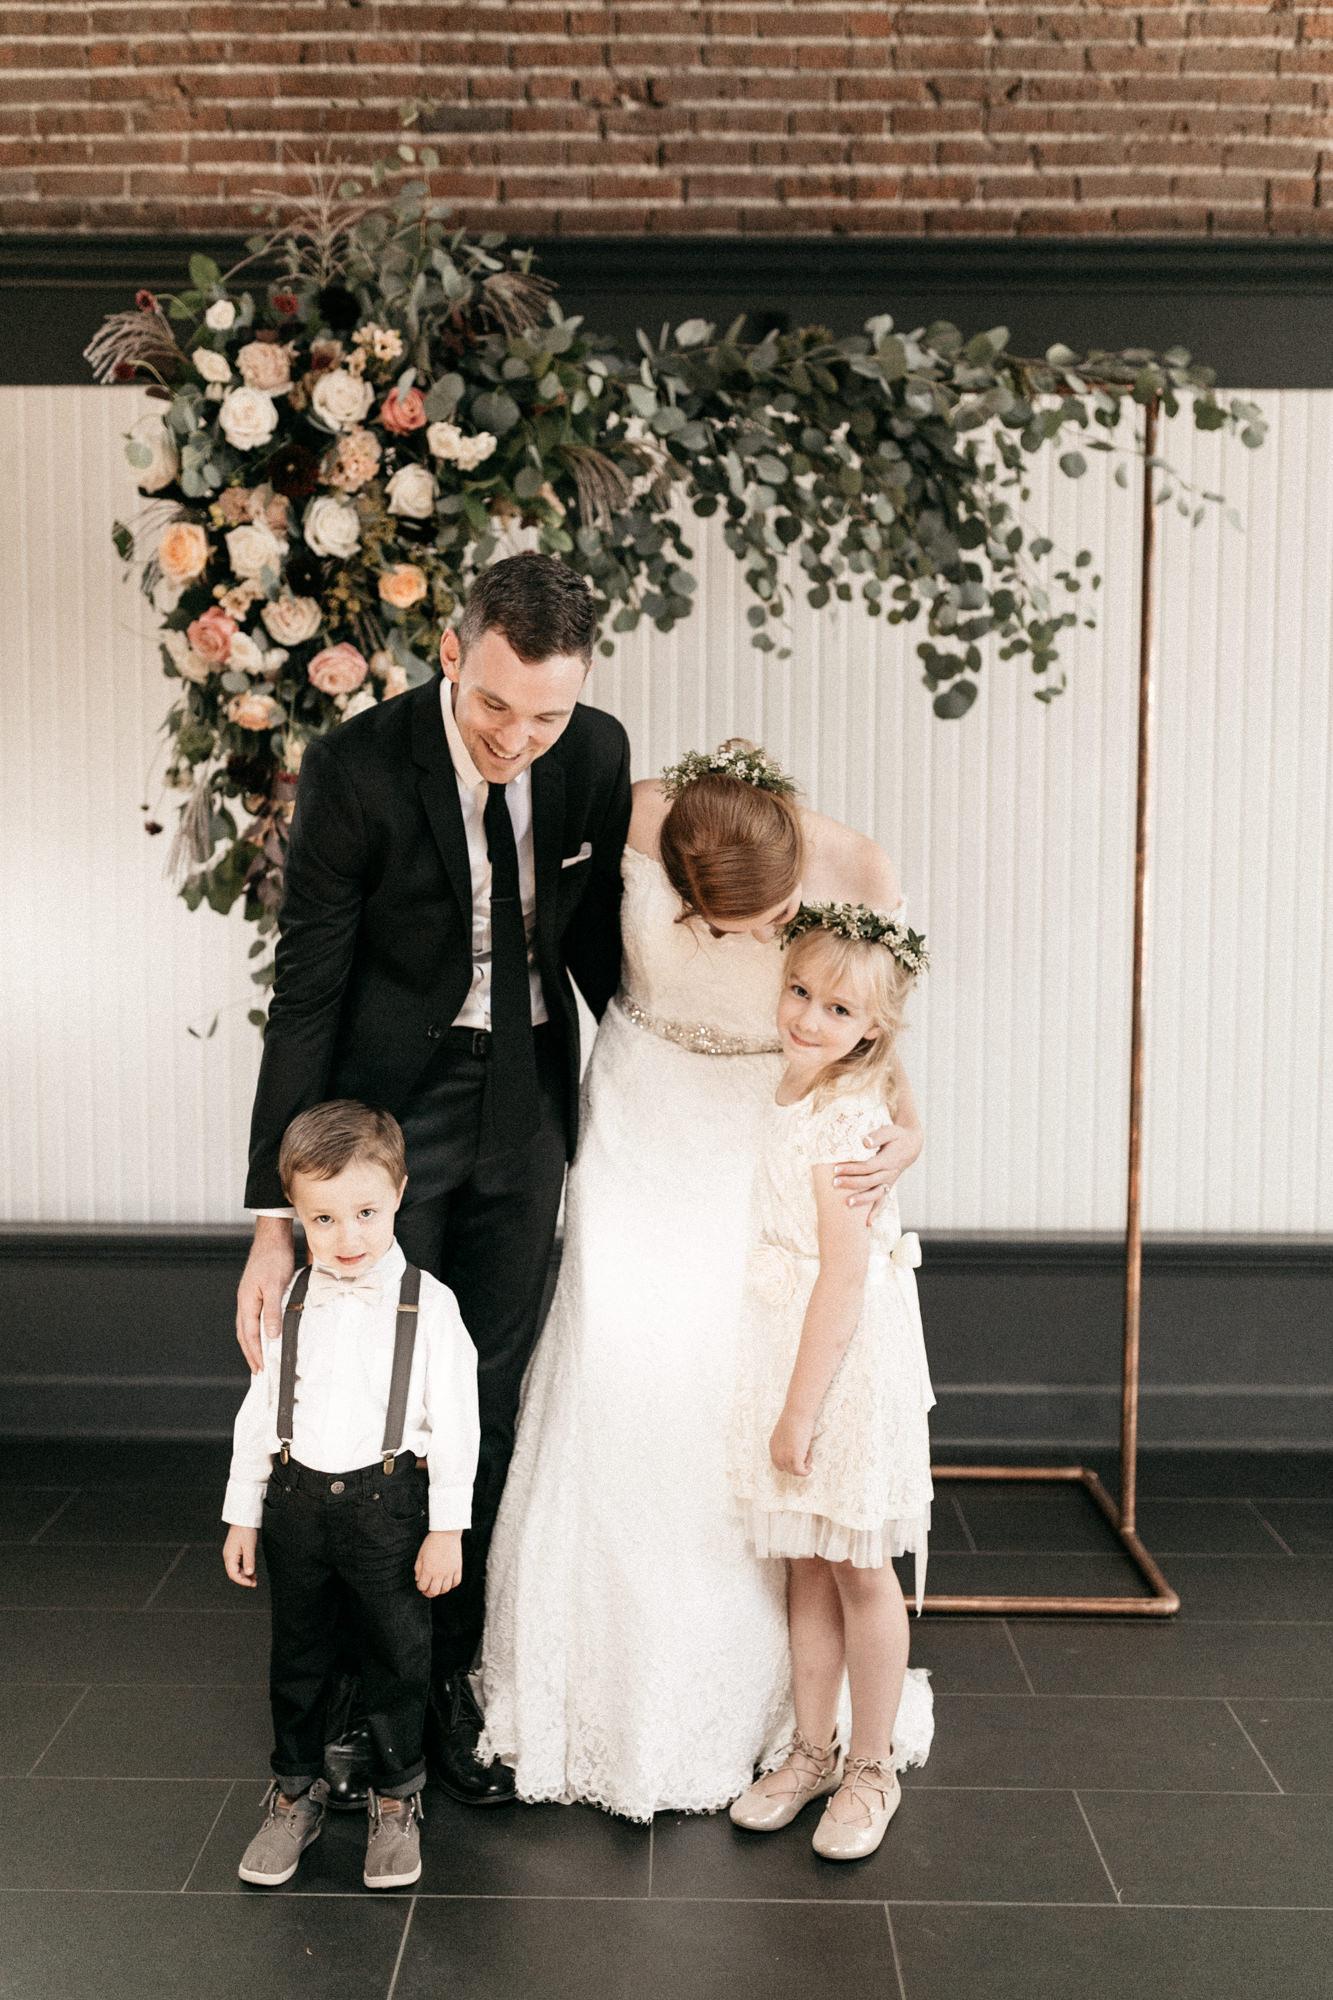 the_evergreen_portland_wedding-55.jpg